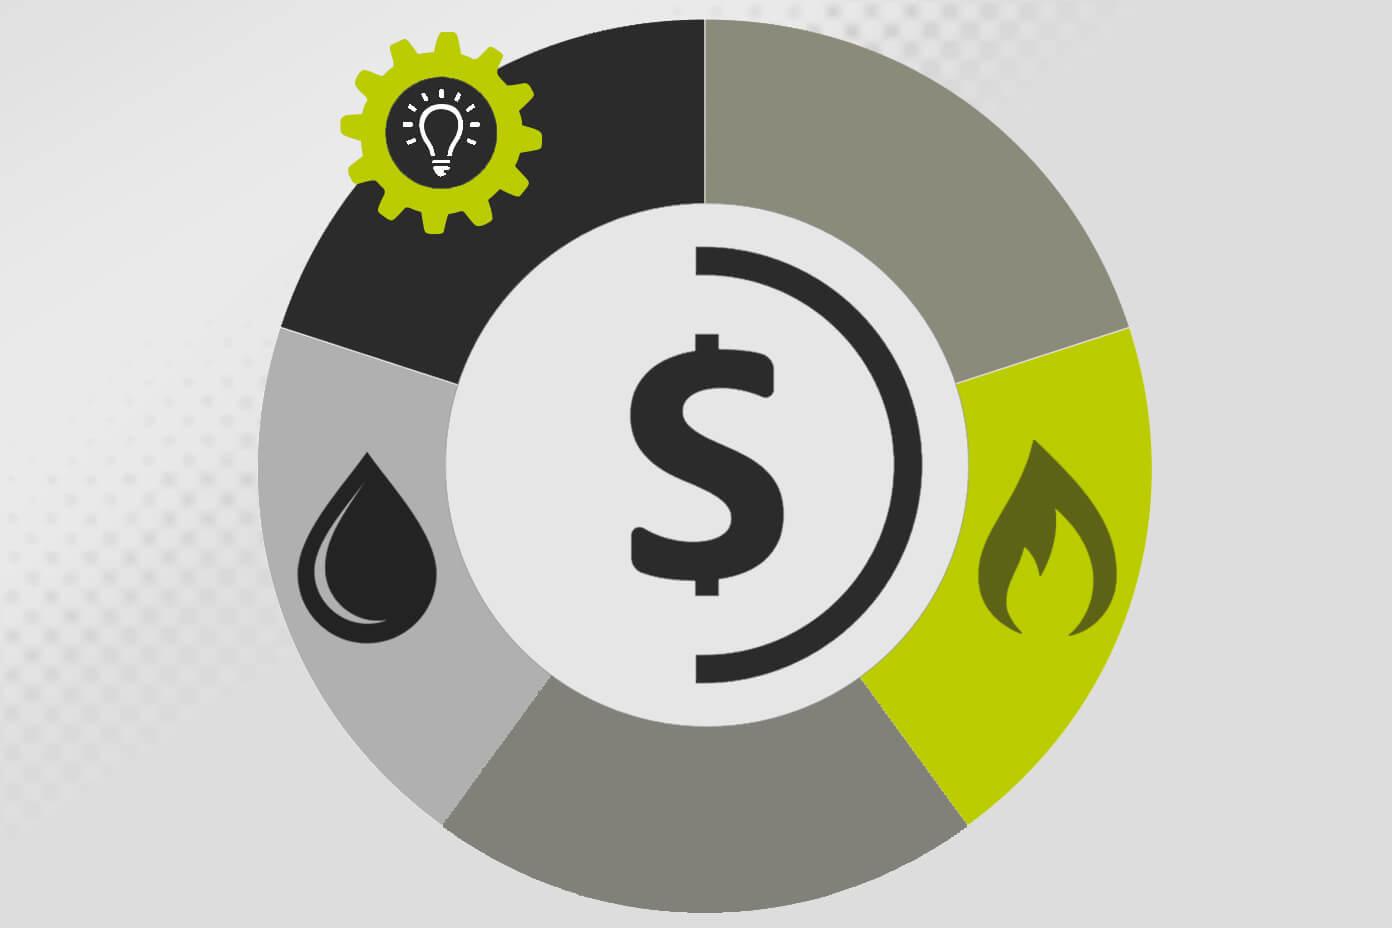 USD 39 million in Oil & Gas R&D Project Grants